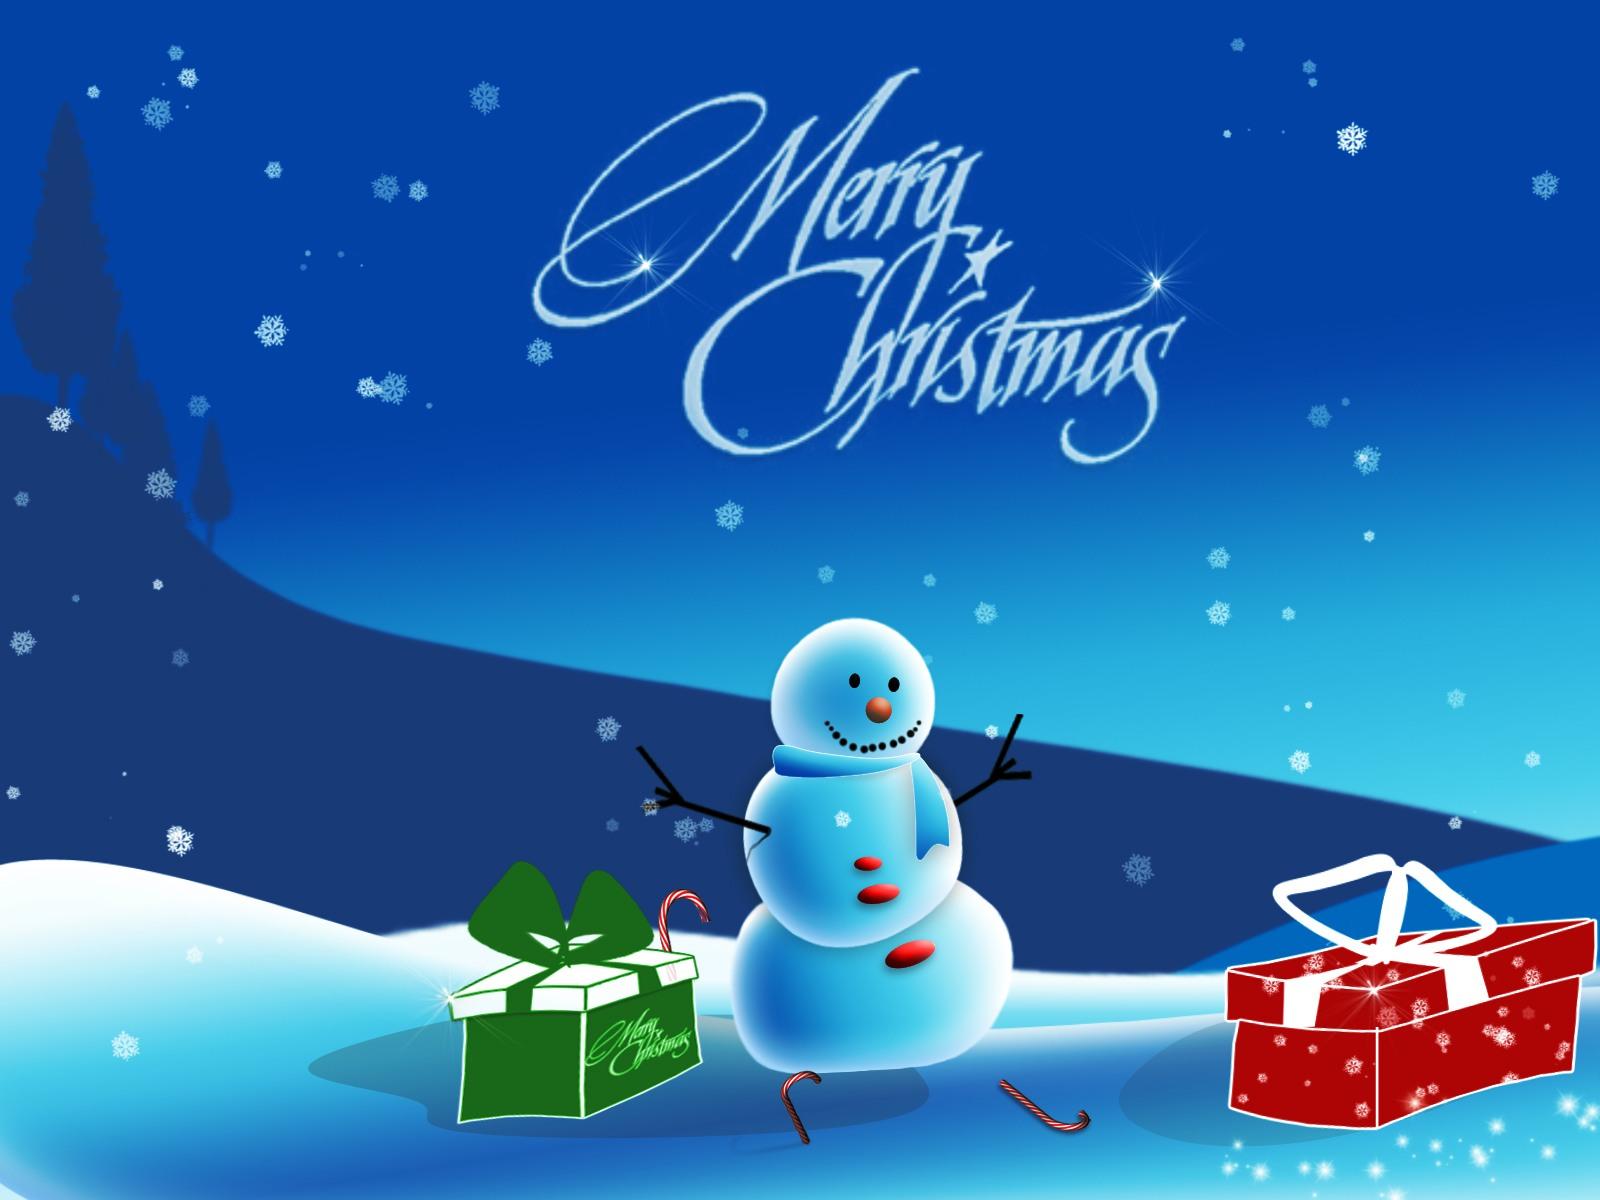 http://1.bp.blogspot.com/-ca5Jh_J5ACs/UMcXB5CKY7I/AAAAAAAAkm4/ozH4IpLmC98/s1600/Natale-sfondi-gratis-wallpapers-natalizi-buon-natale.jpg